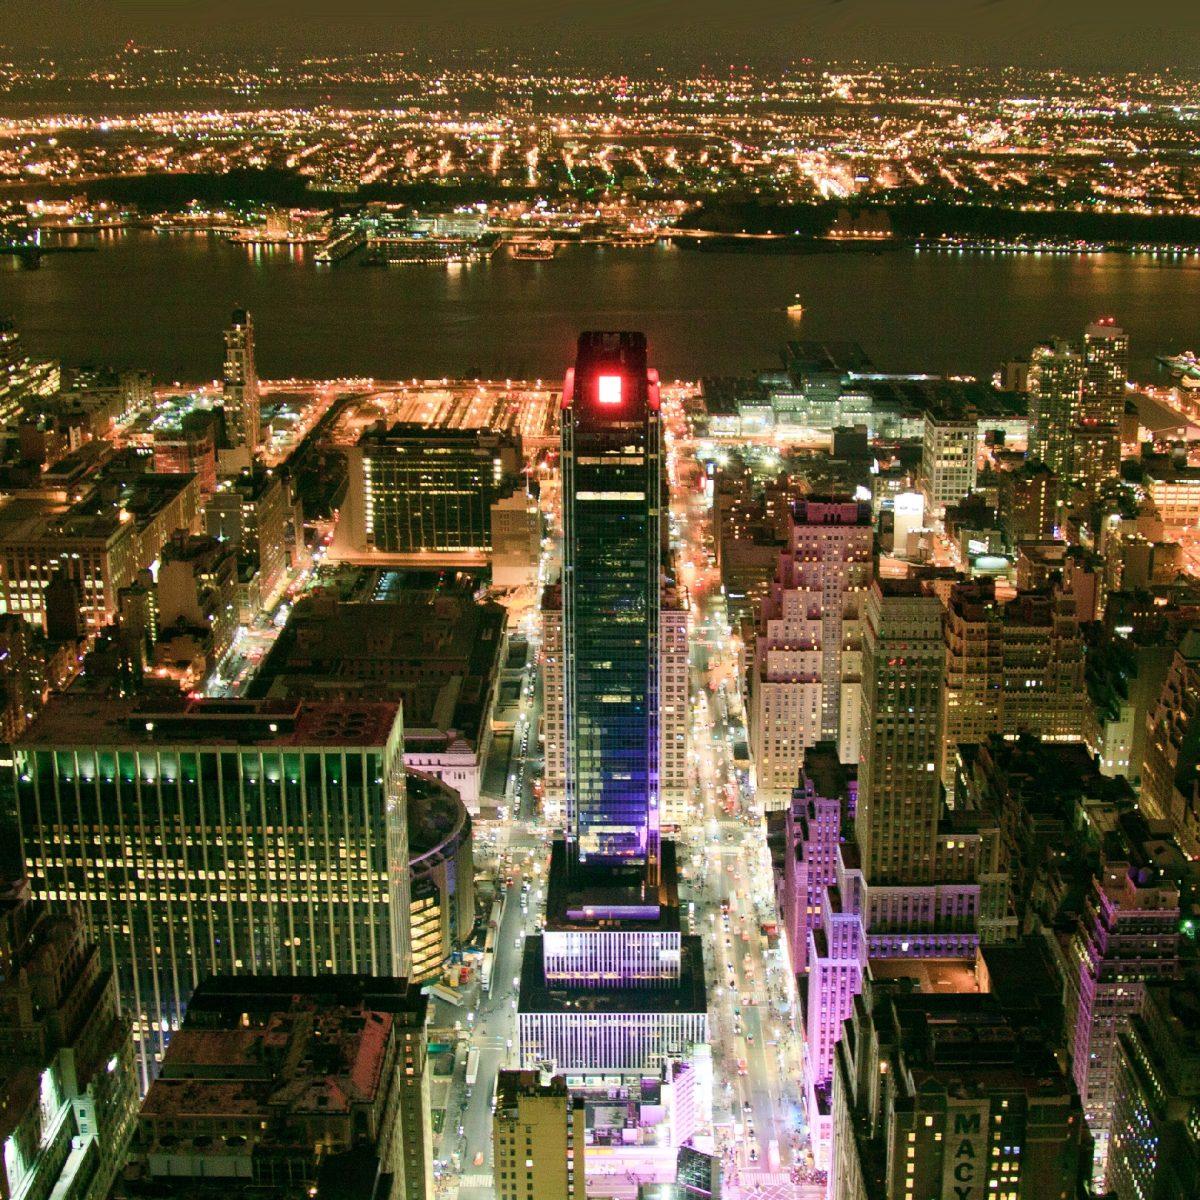 Вид на Гудзон с Эмпайр Стейт Билдинг, Нью-Йорк | Владимир Фильваркив